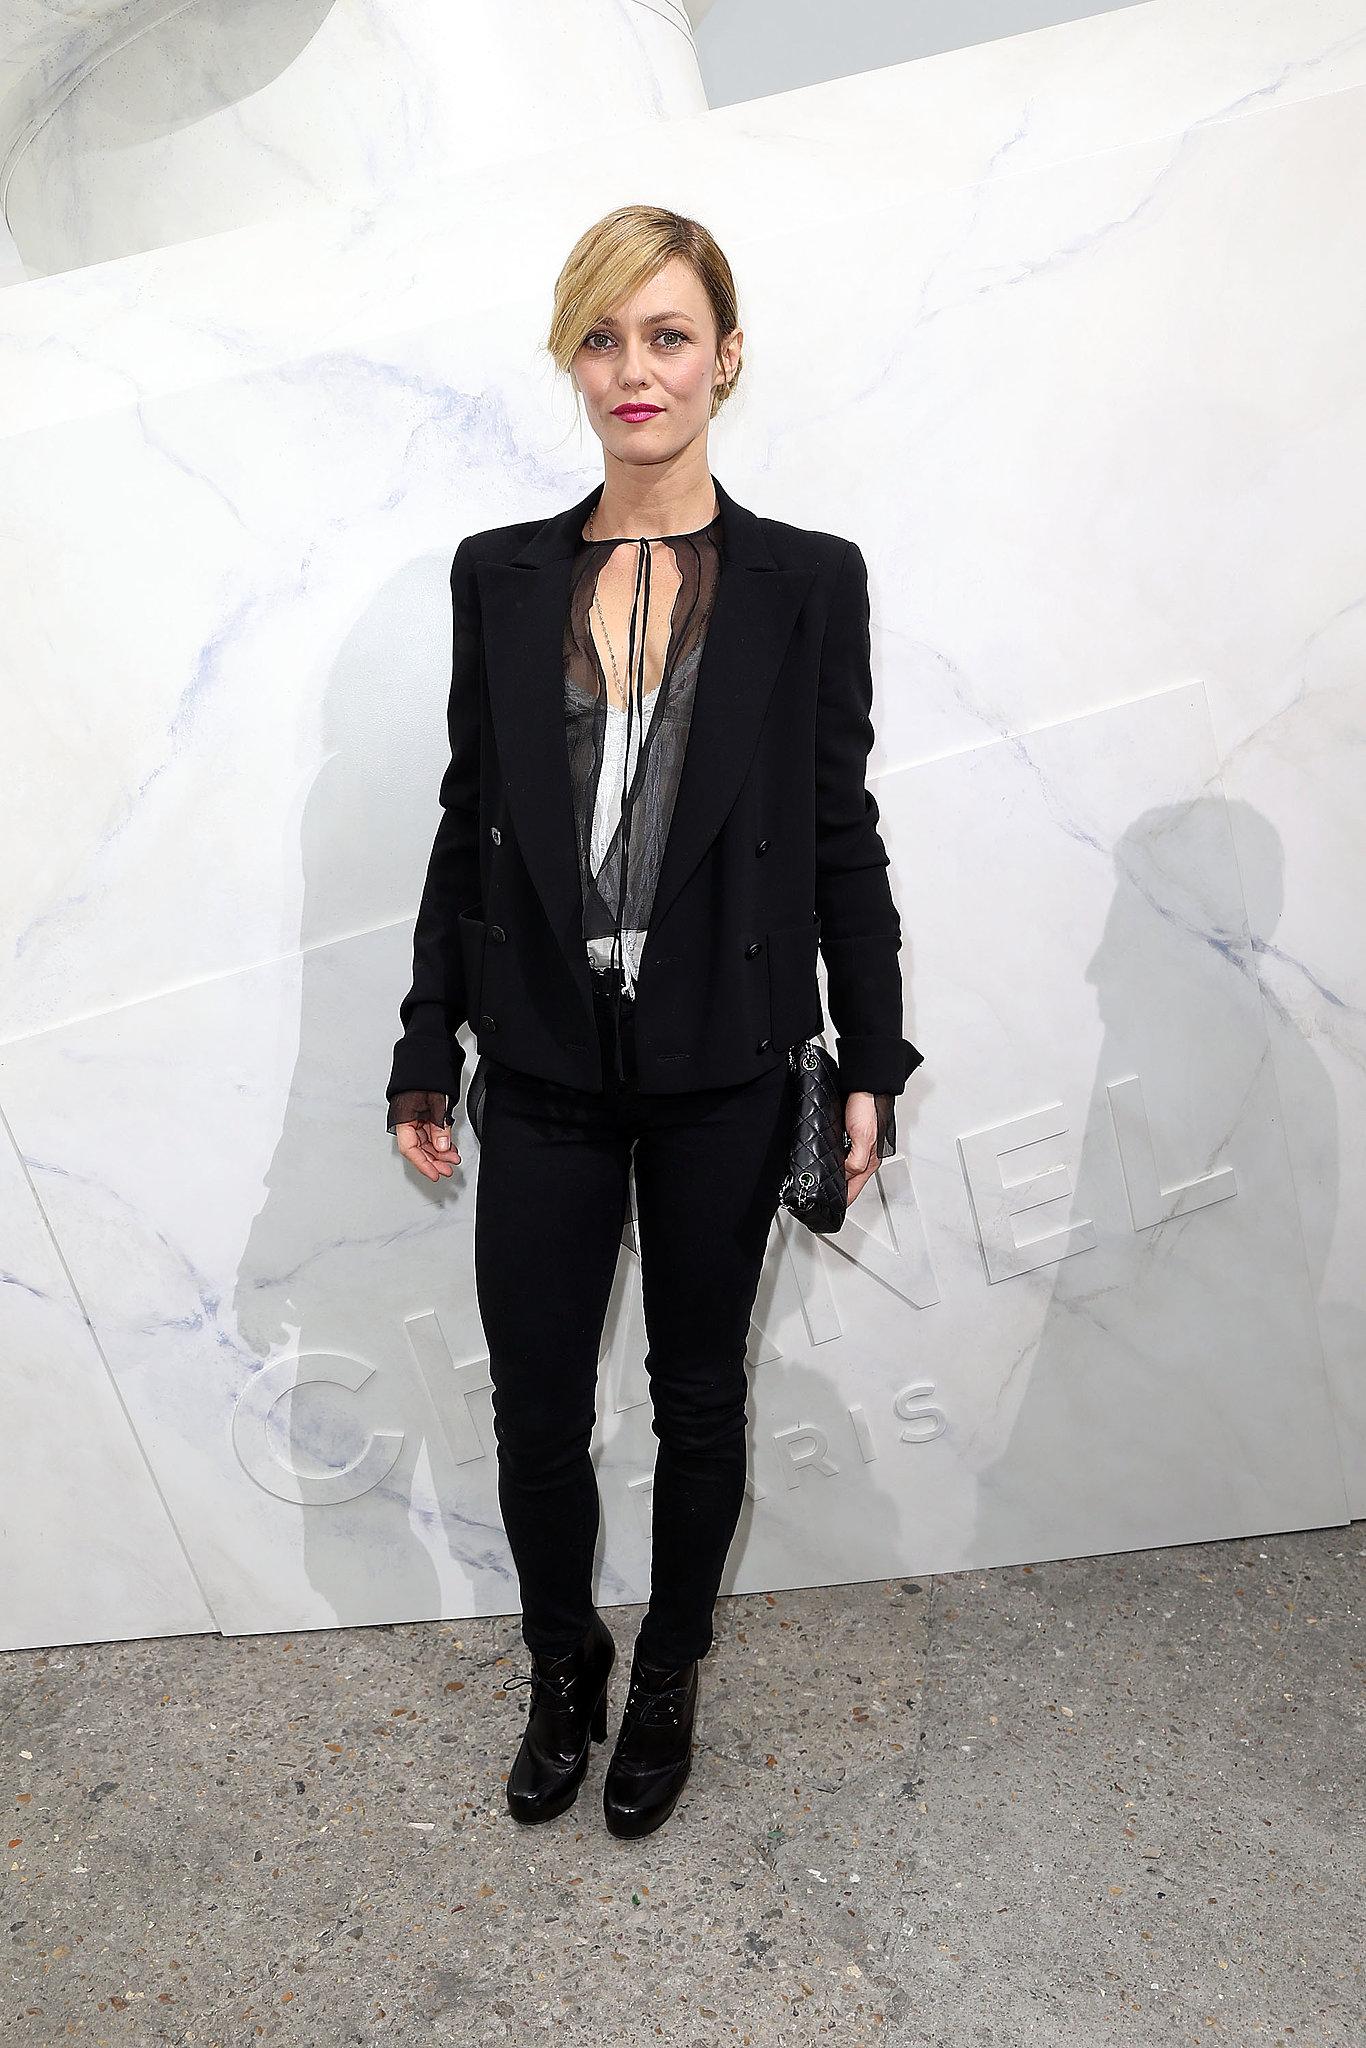 Vanessa Paradis wore black to Chanel.